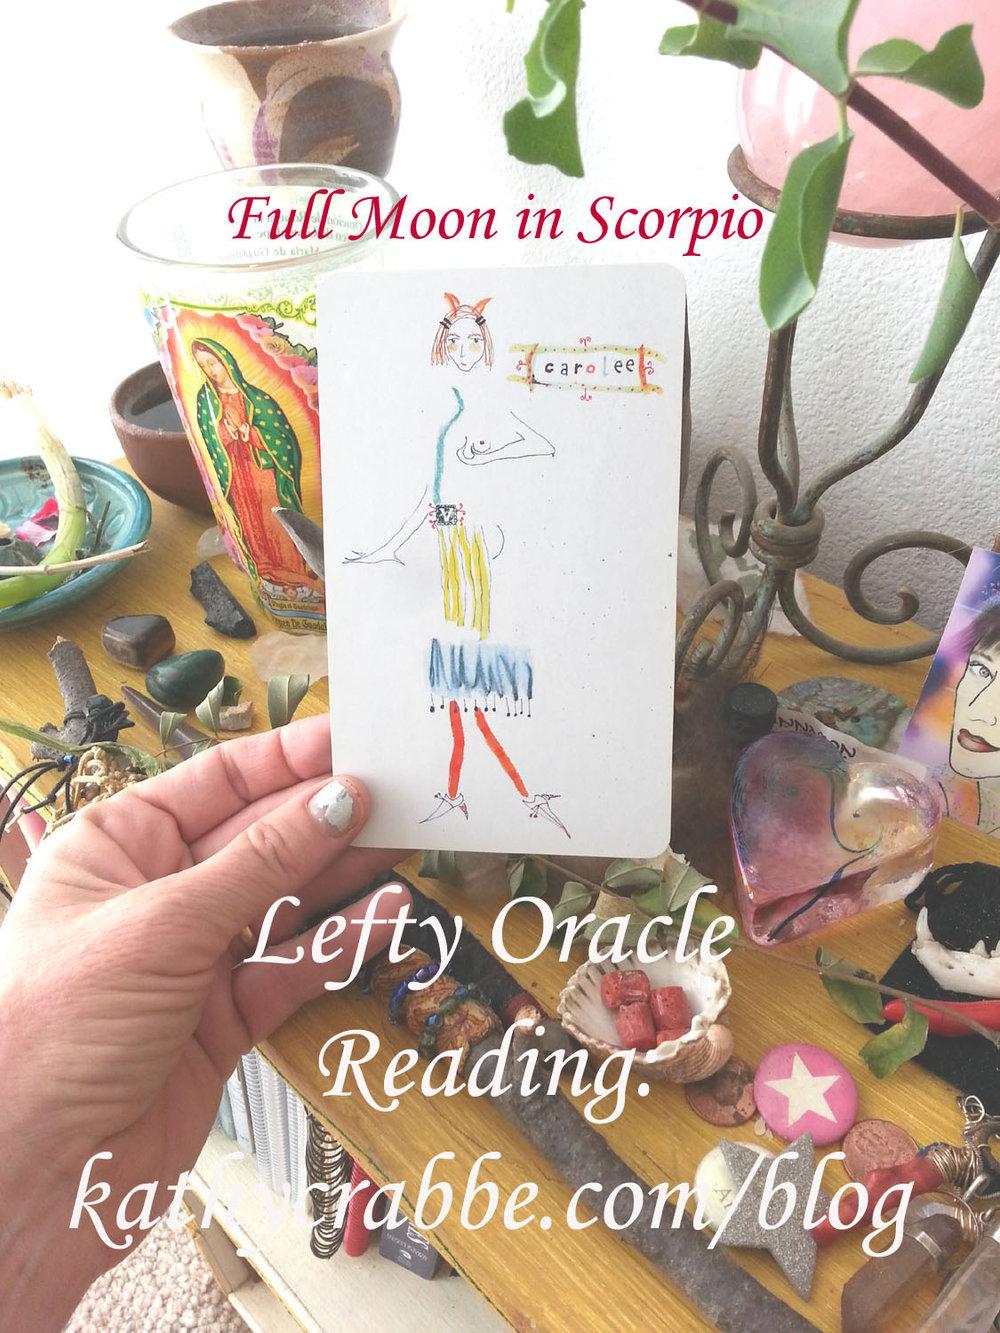 Lefty Oracle Carolee - Full Moon in Scorpio Card